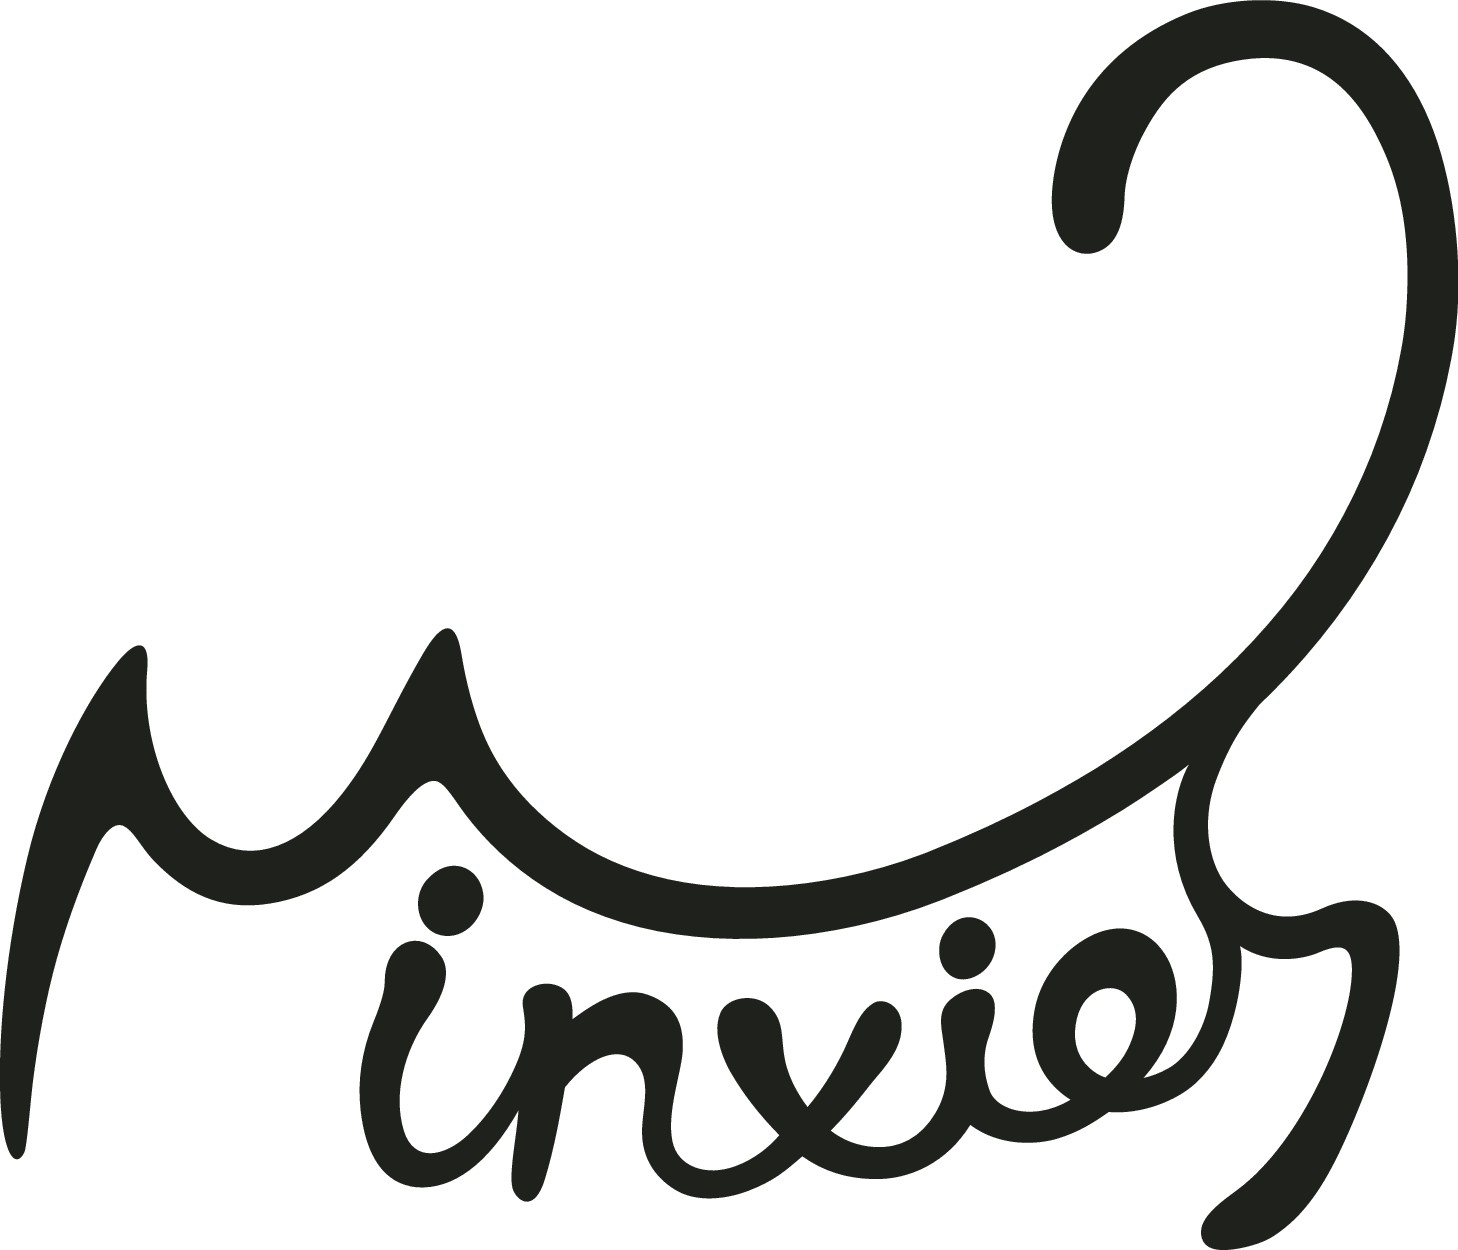 Finish/improve script logo